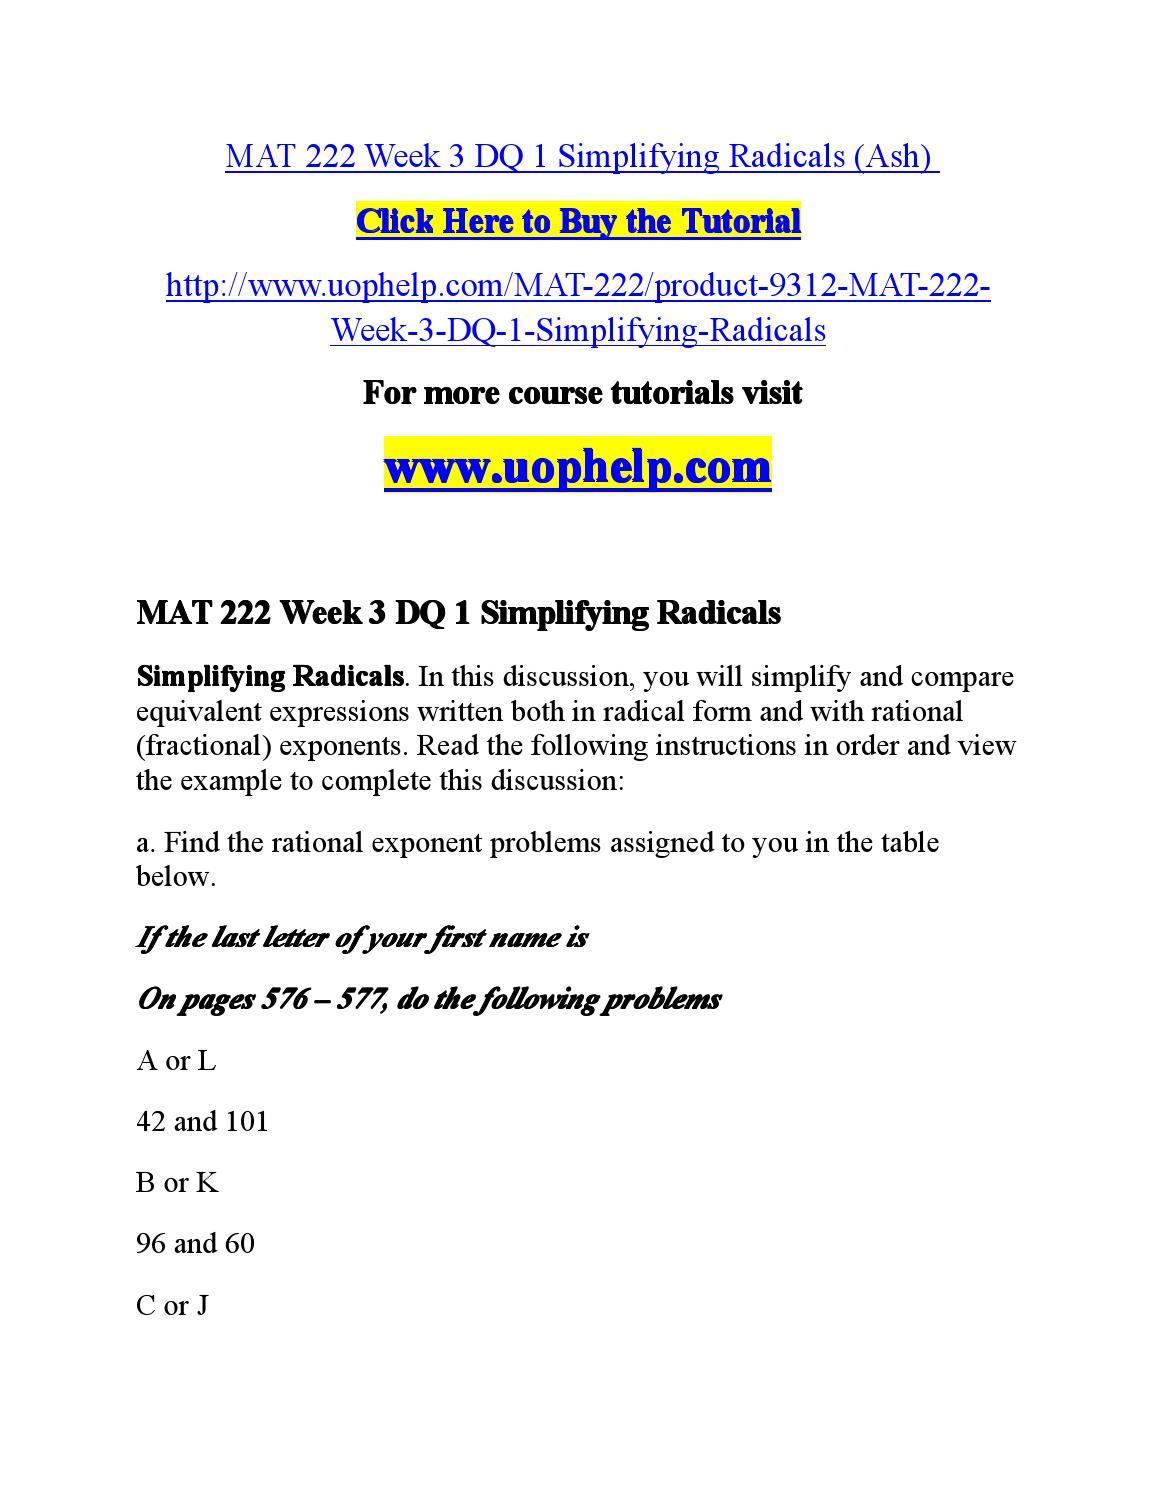 Math 222 Week 4 Discussion P38 (M or Z) and P48 (A or L) MS excel file